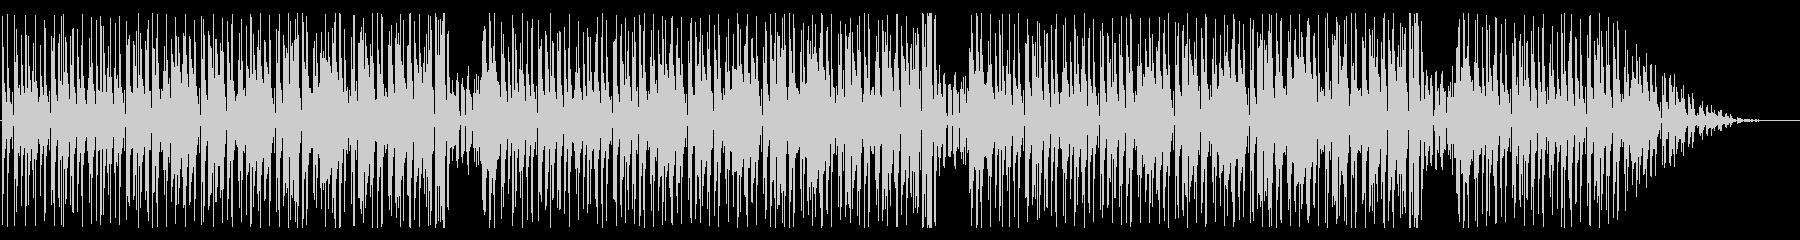 bgm38の未再生の波形